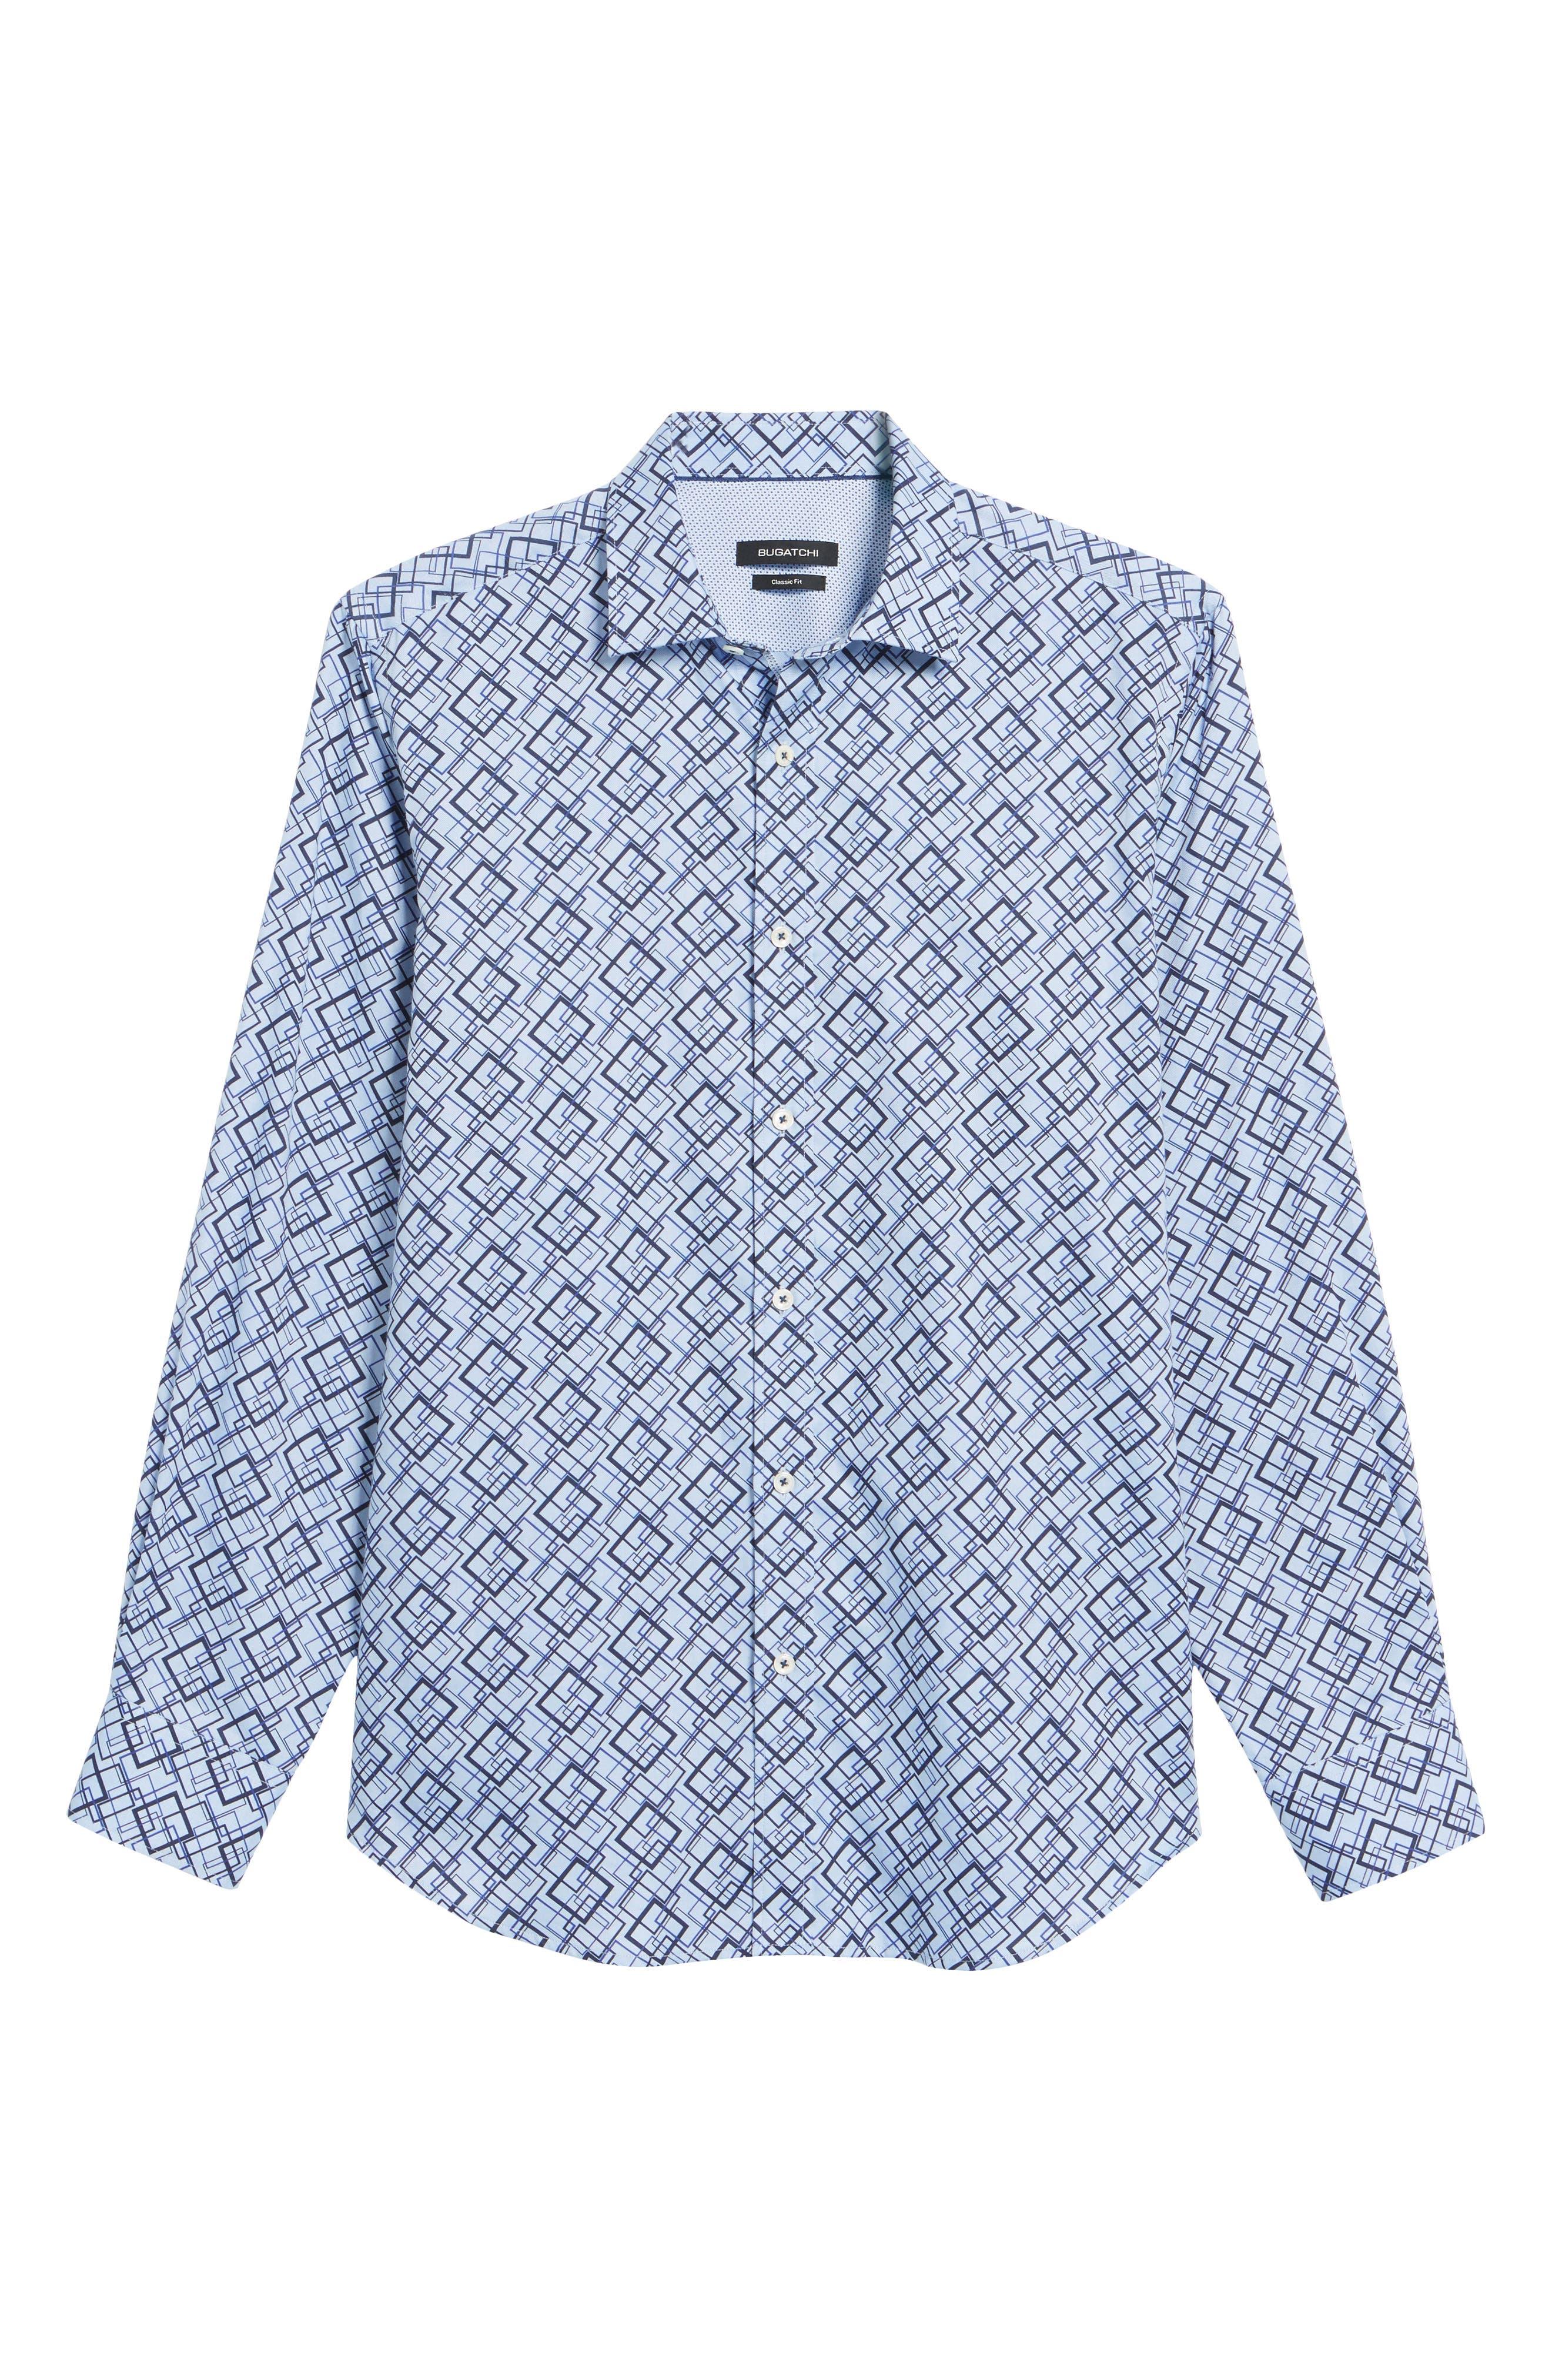 Classic Fit Woven Sport Shirt,                             Alternate thumbnail 6, color,                             Classic Blue